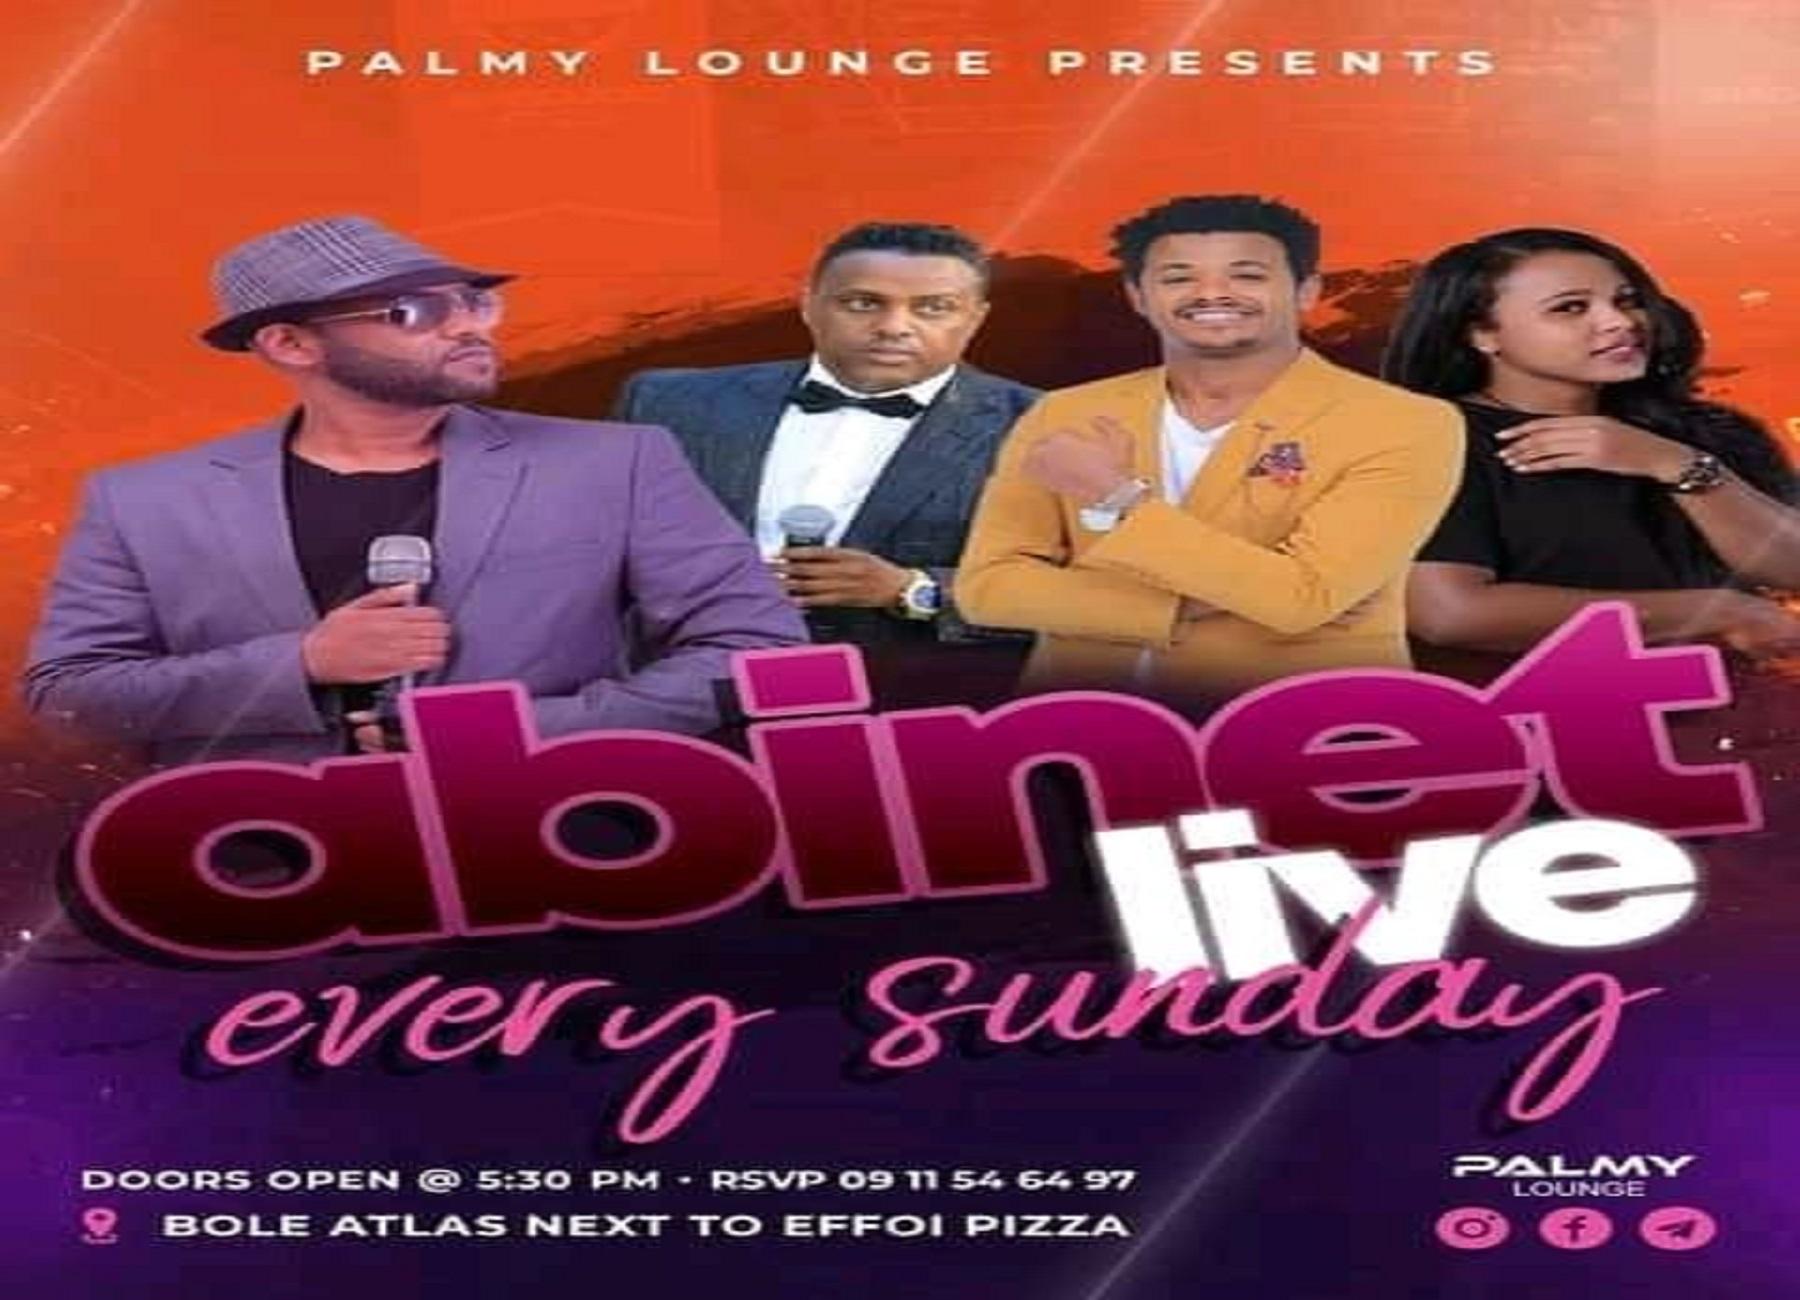 Abinet Sunday's